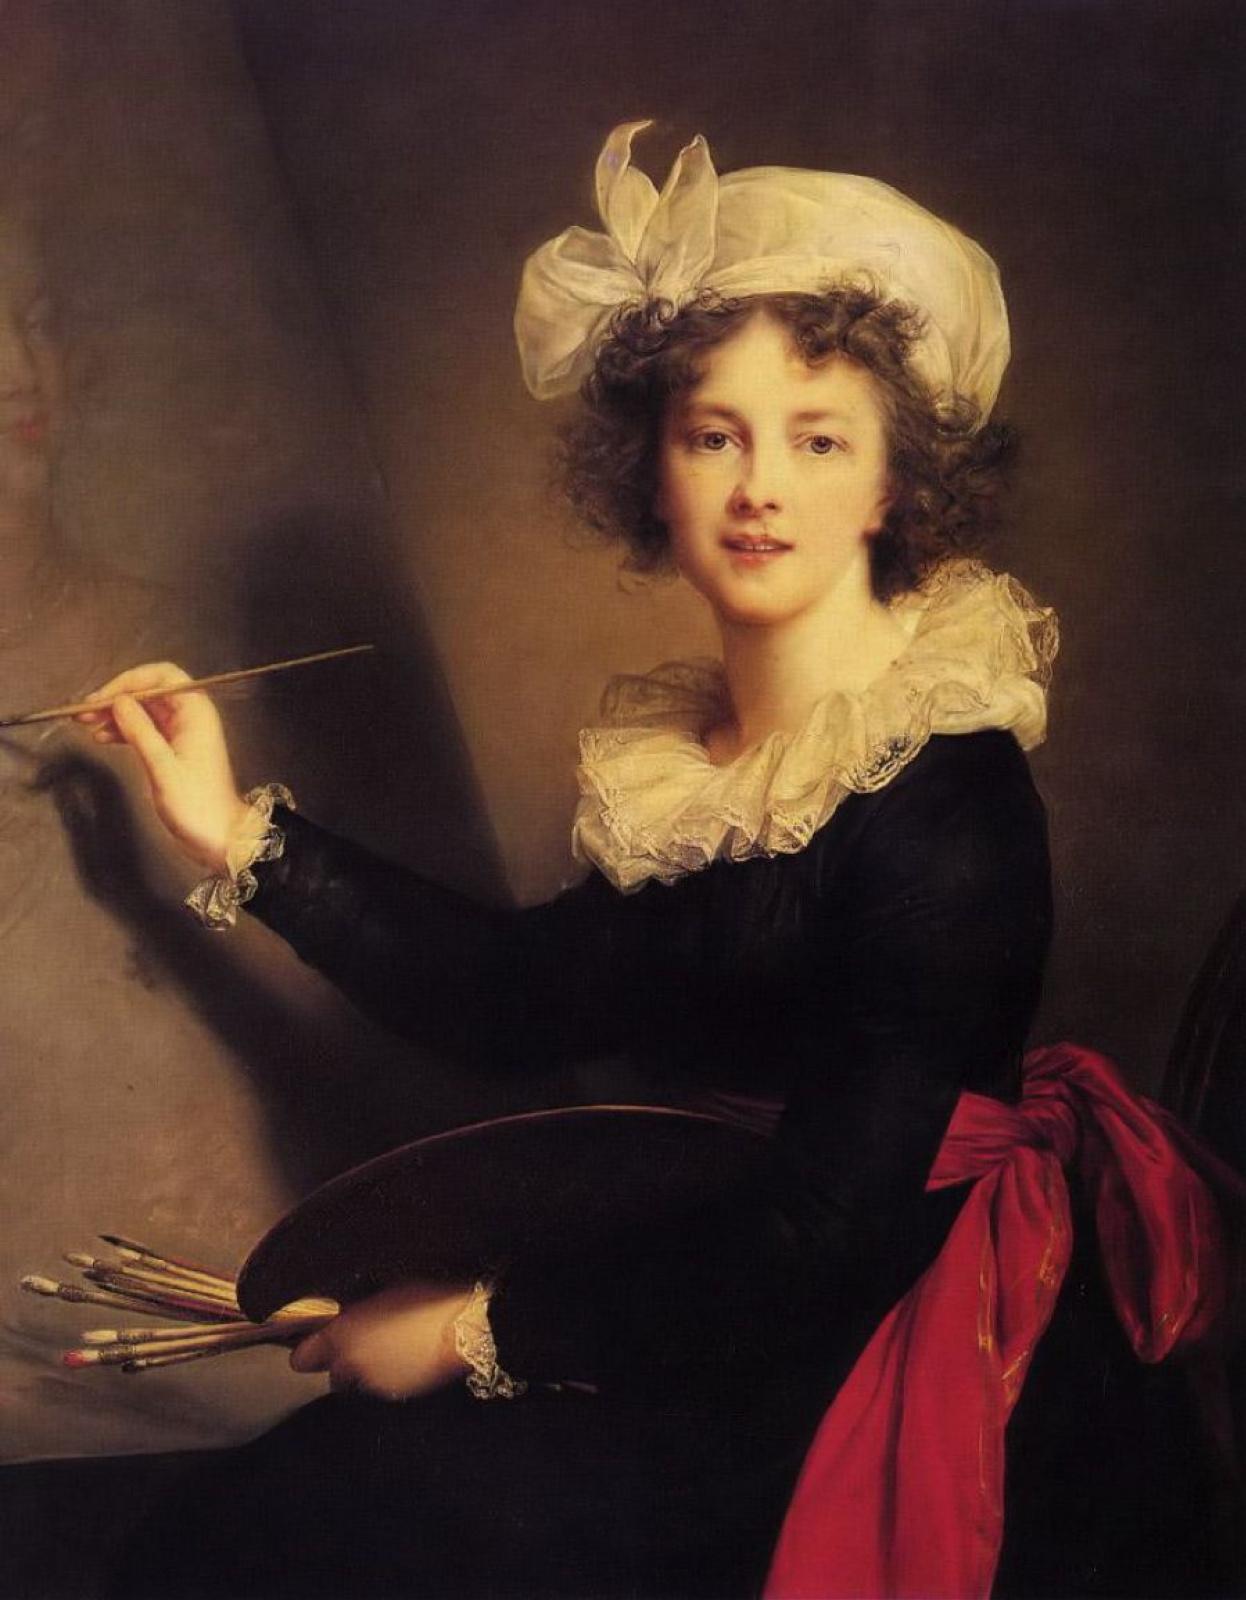 Elizabeth Vigee Le Brun. Self-portrait with palette